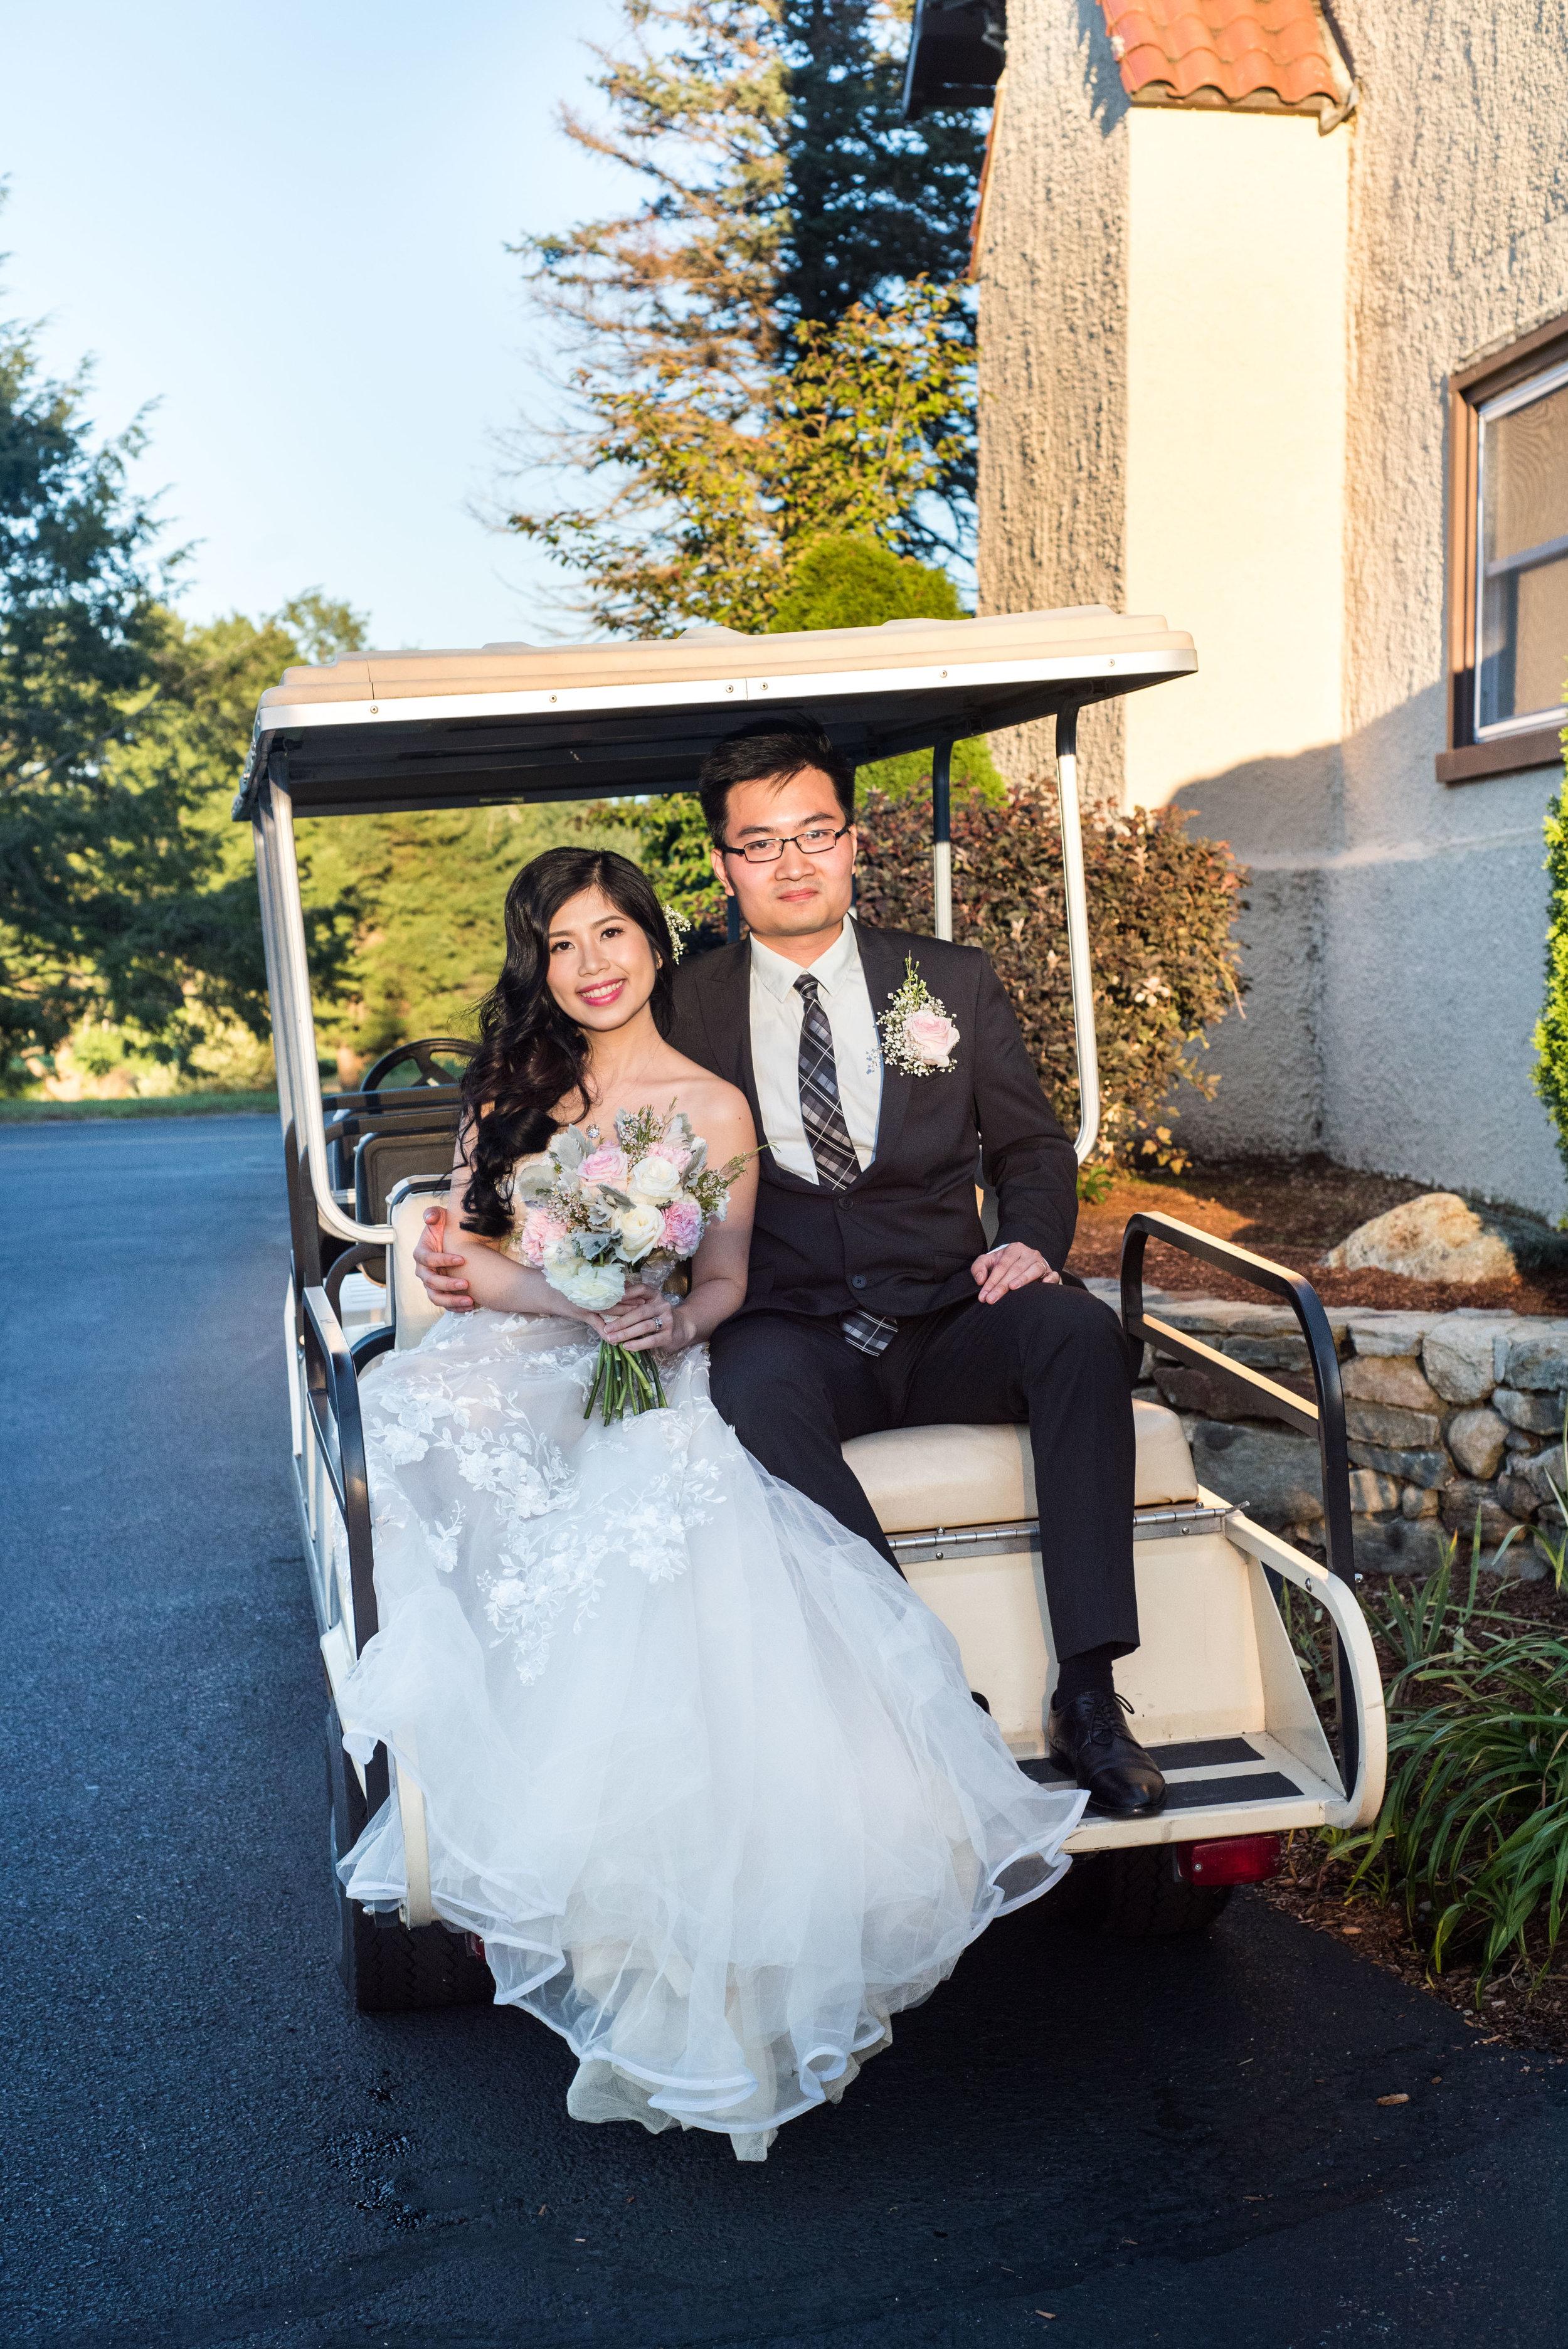 Boston Wedding Photographer | Boston Weddings | New England Wedding Photographer |Iryna's Photography